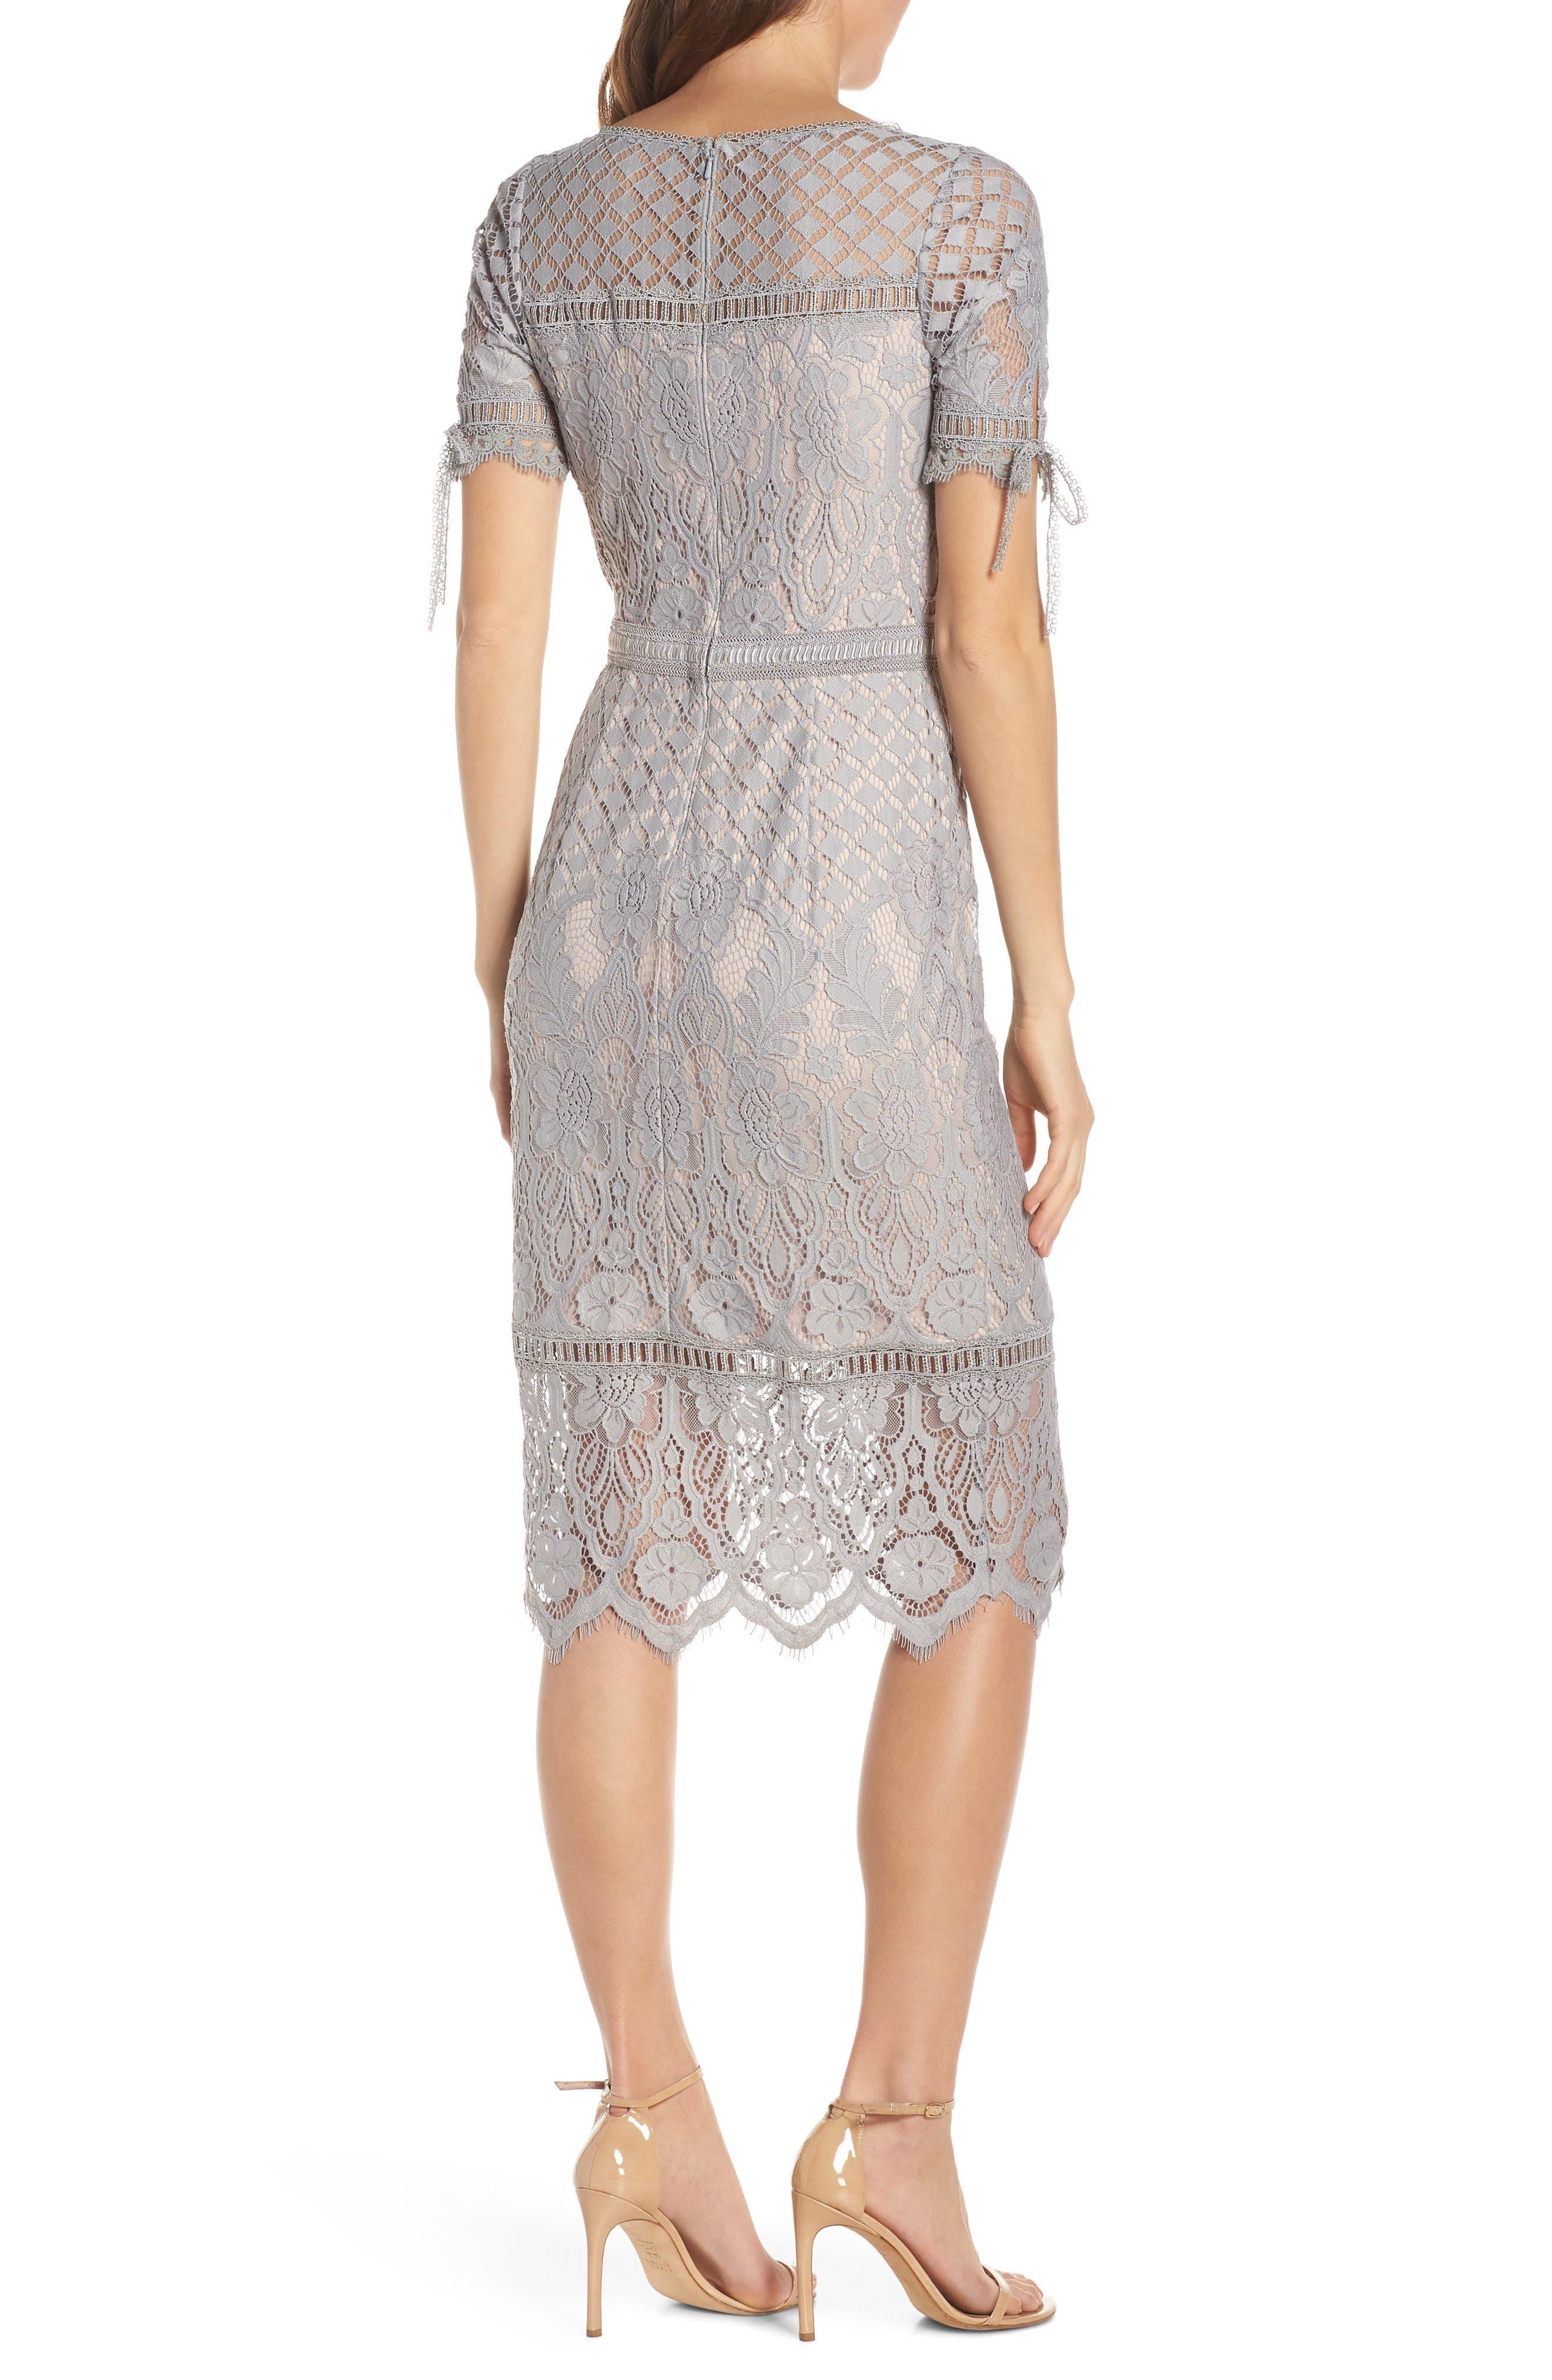 TADASHI SHOJI, Tie Sleeve Lace Sheath Dress, Alternate thumbnail 2, color, PEWTER/ PETAL